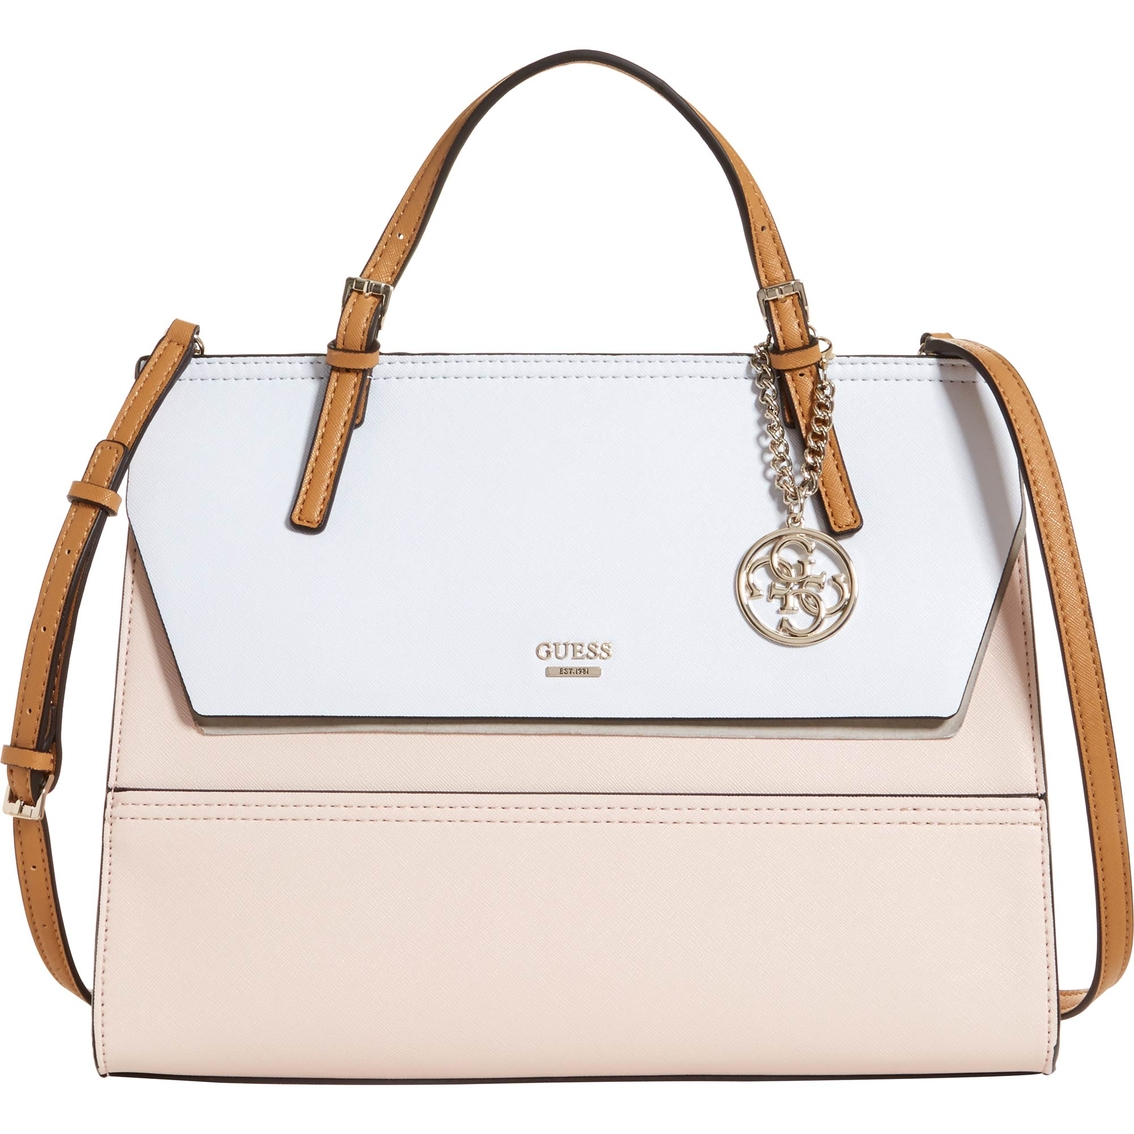 Guess Huntley Top Handle Satchel Handbag